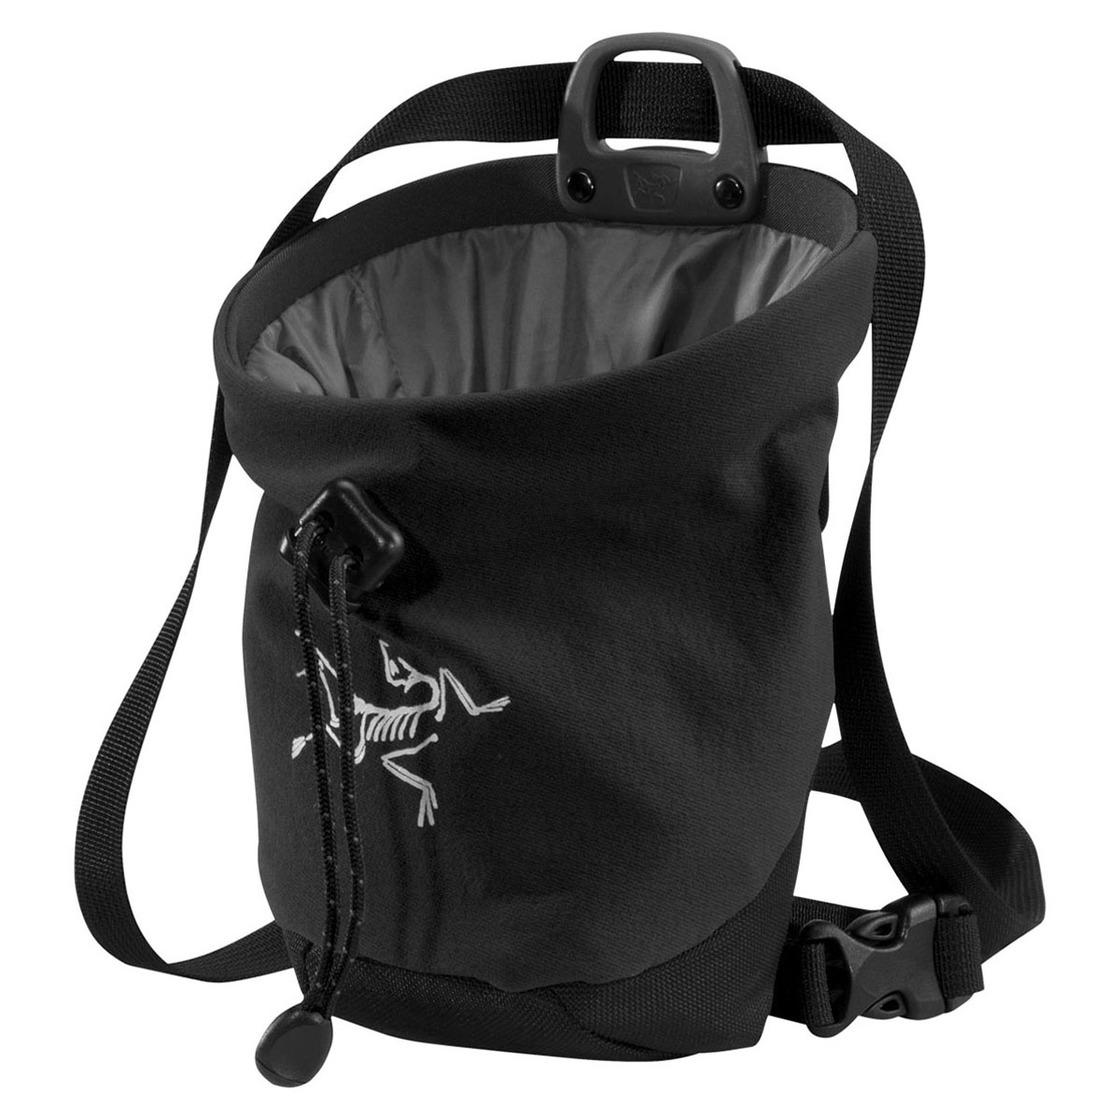 C40 Chalk Bag, Arc'teryx